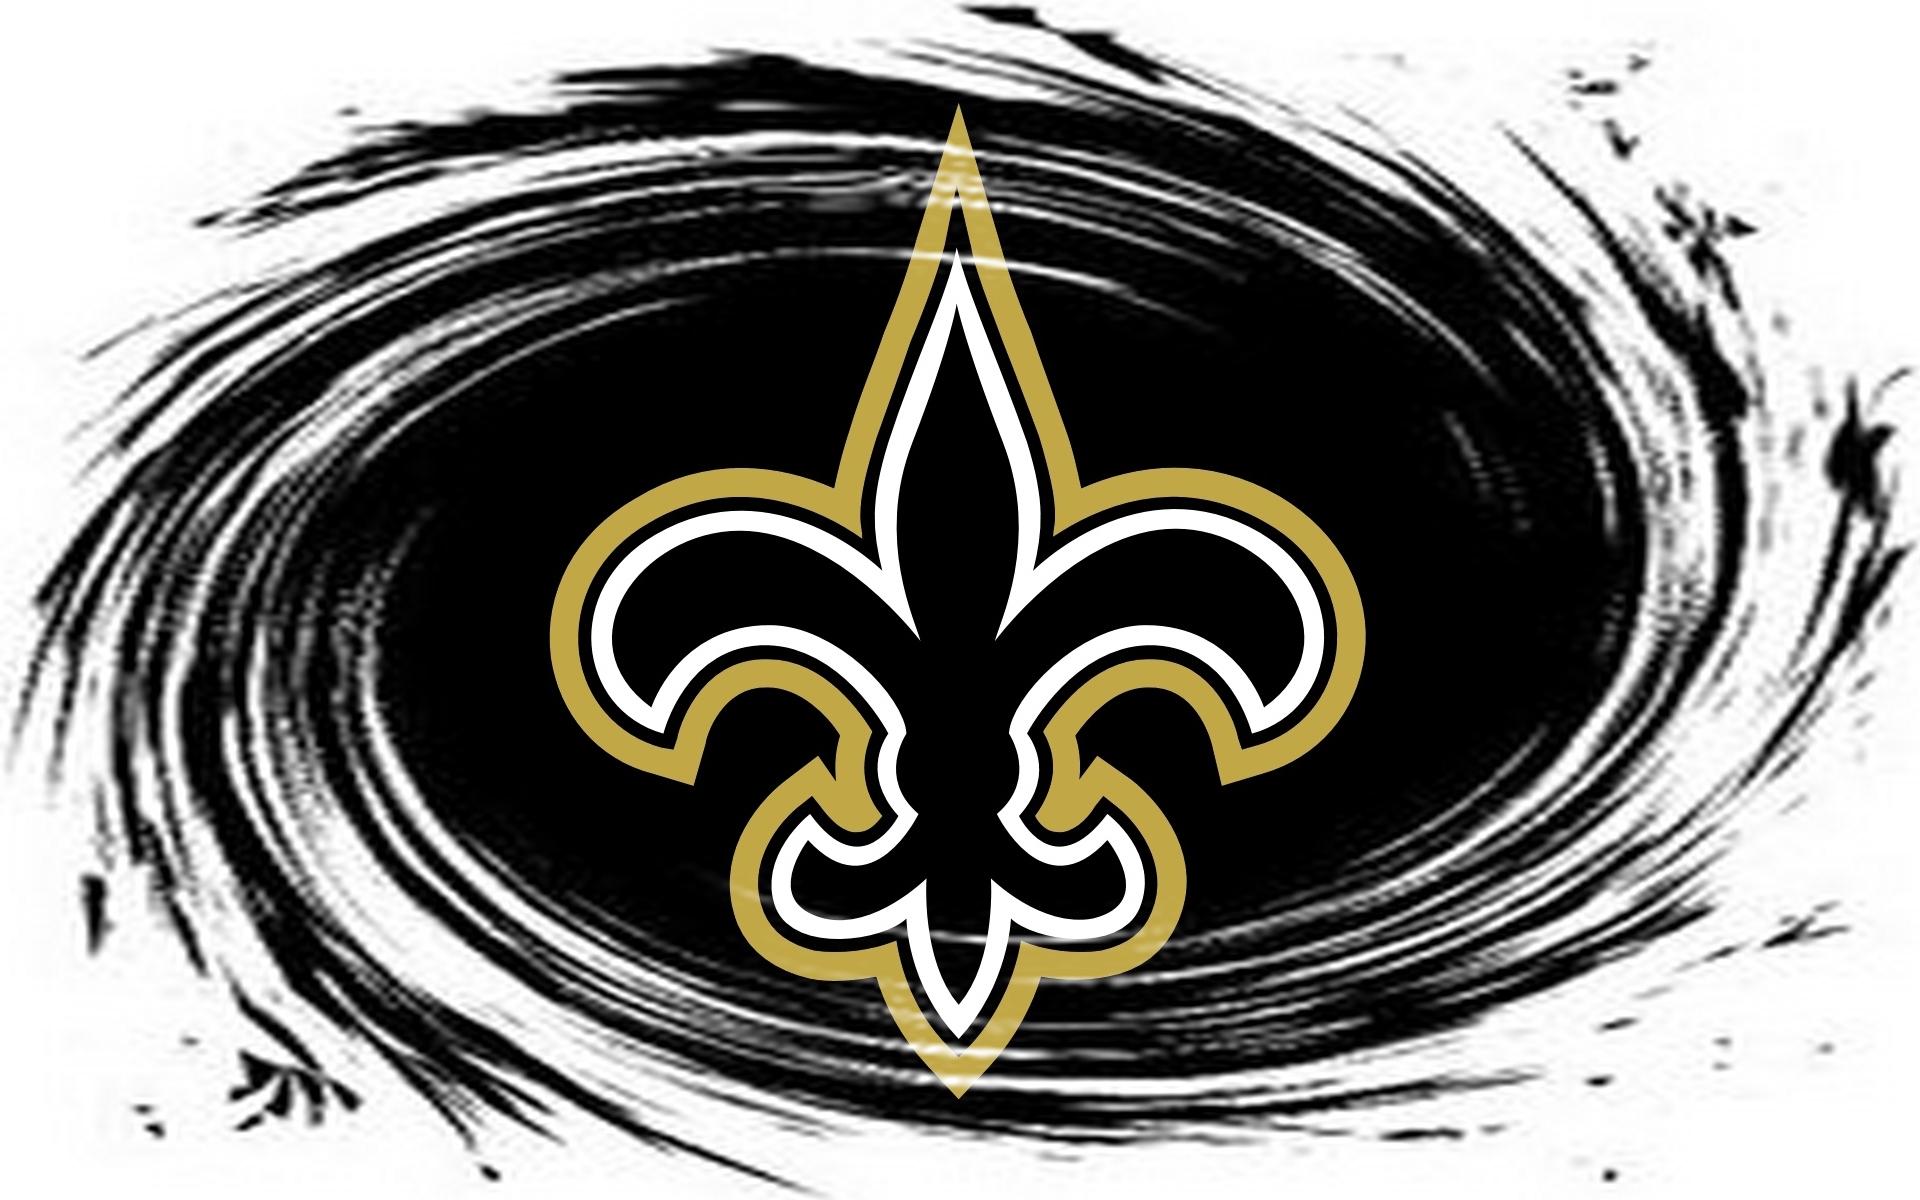 Saints Logo Whirlpool Black 1920x1200 WIDE NFL New Orleans Saints 1920x1200